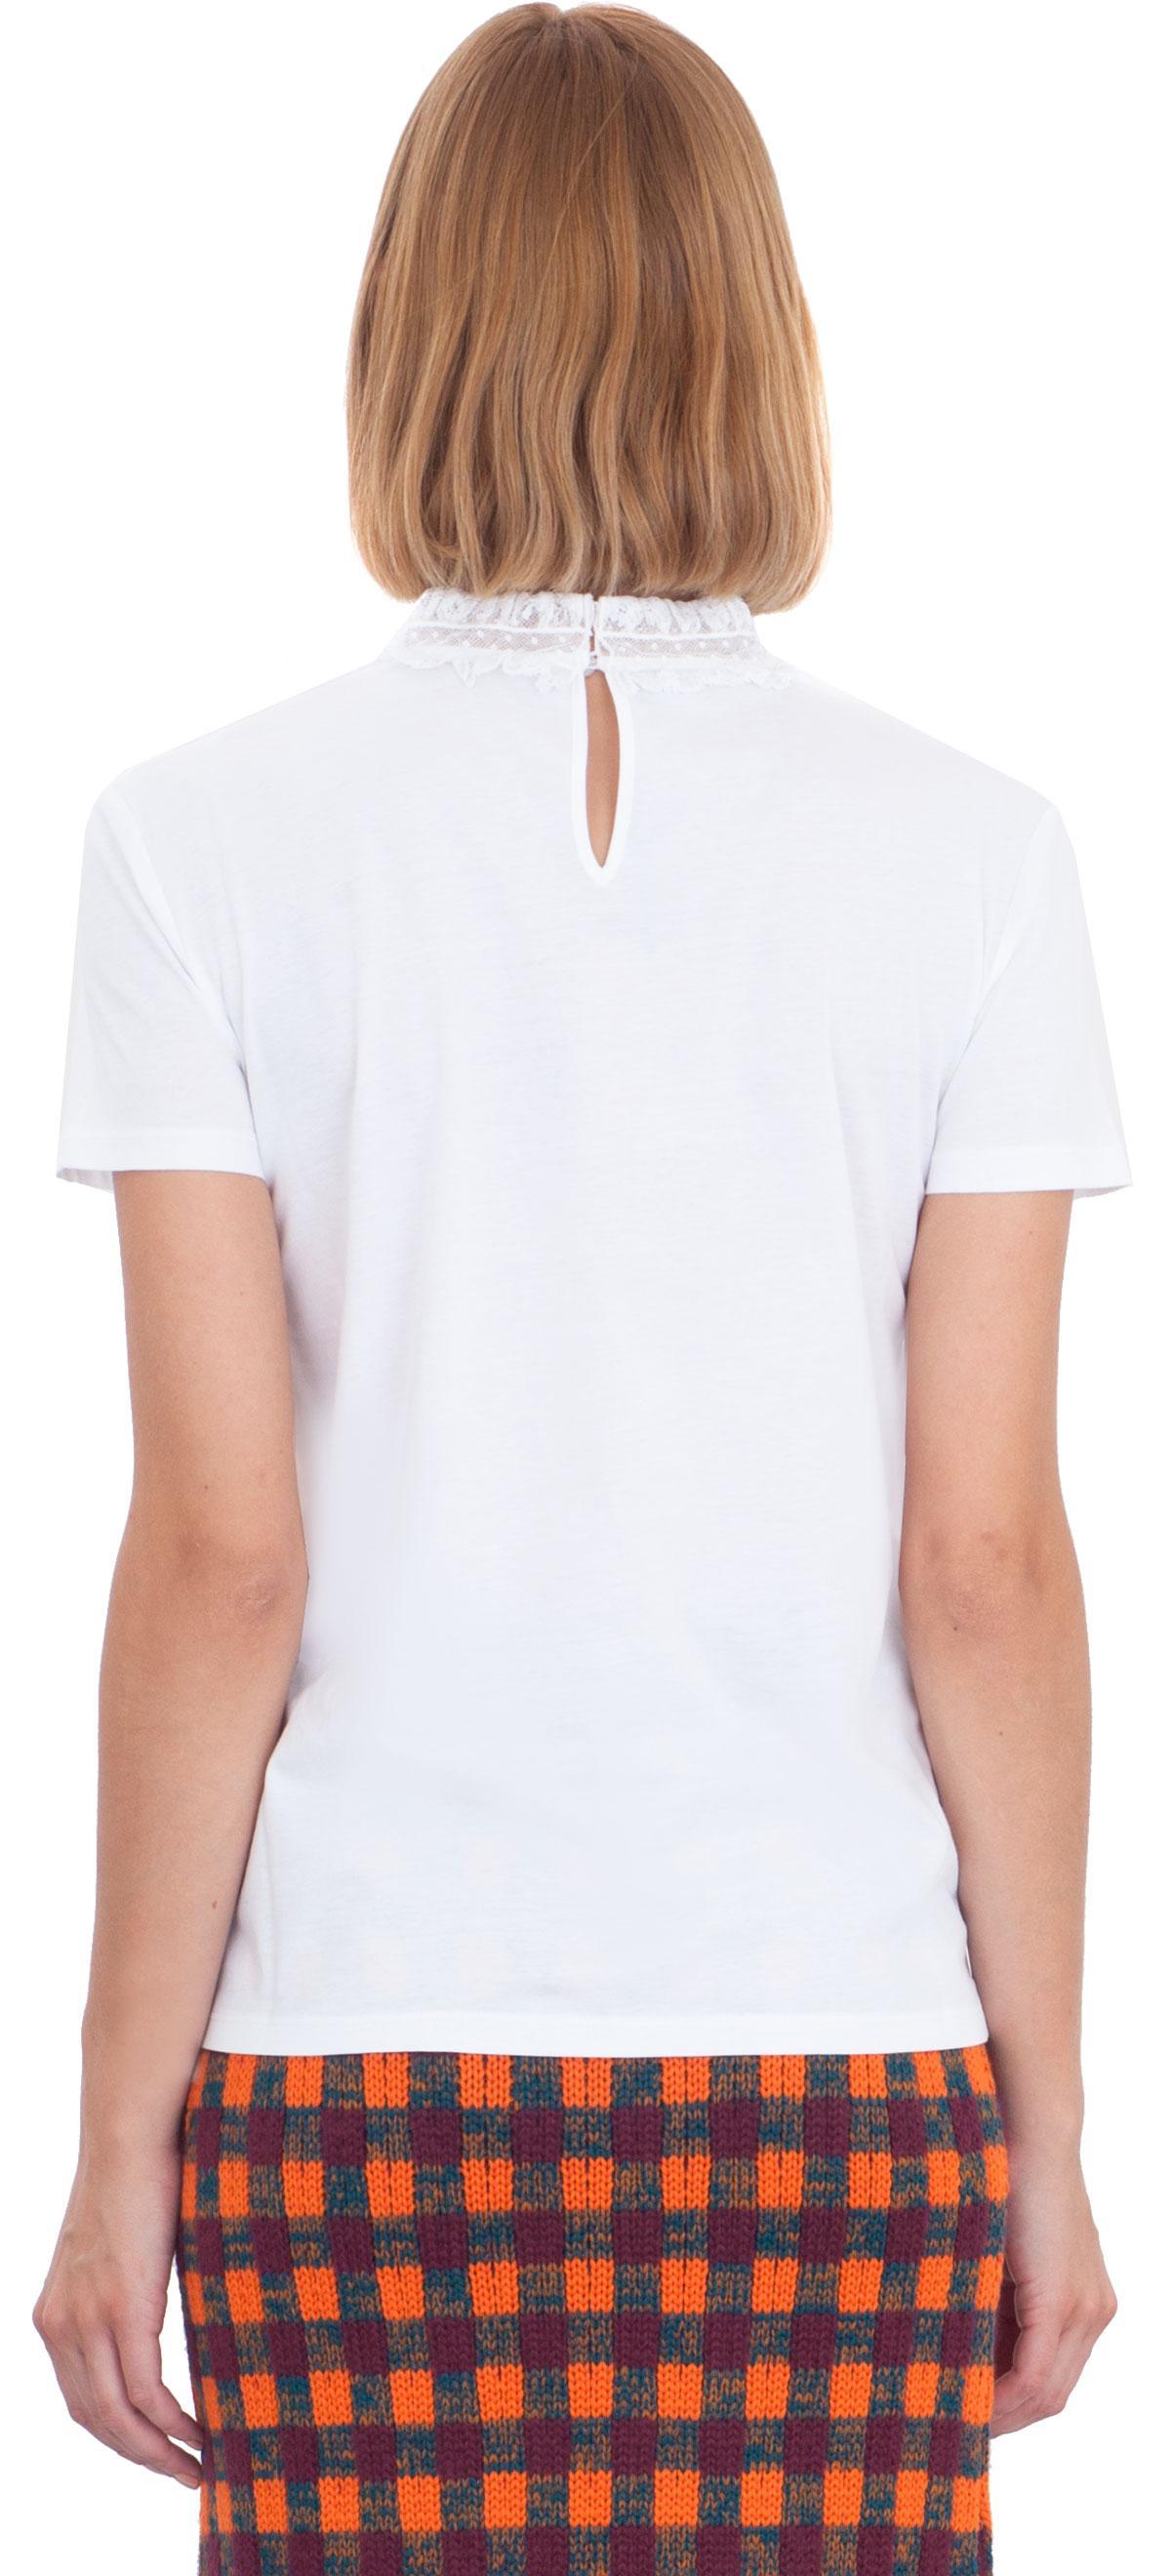 Lyst miu miu lace trimmed cotton t shirt in white for Miu miu t shirt